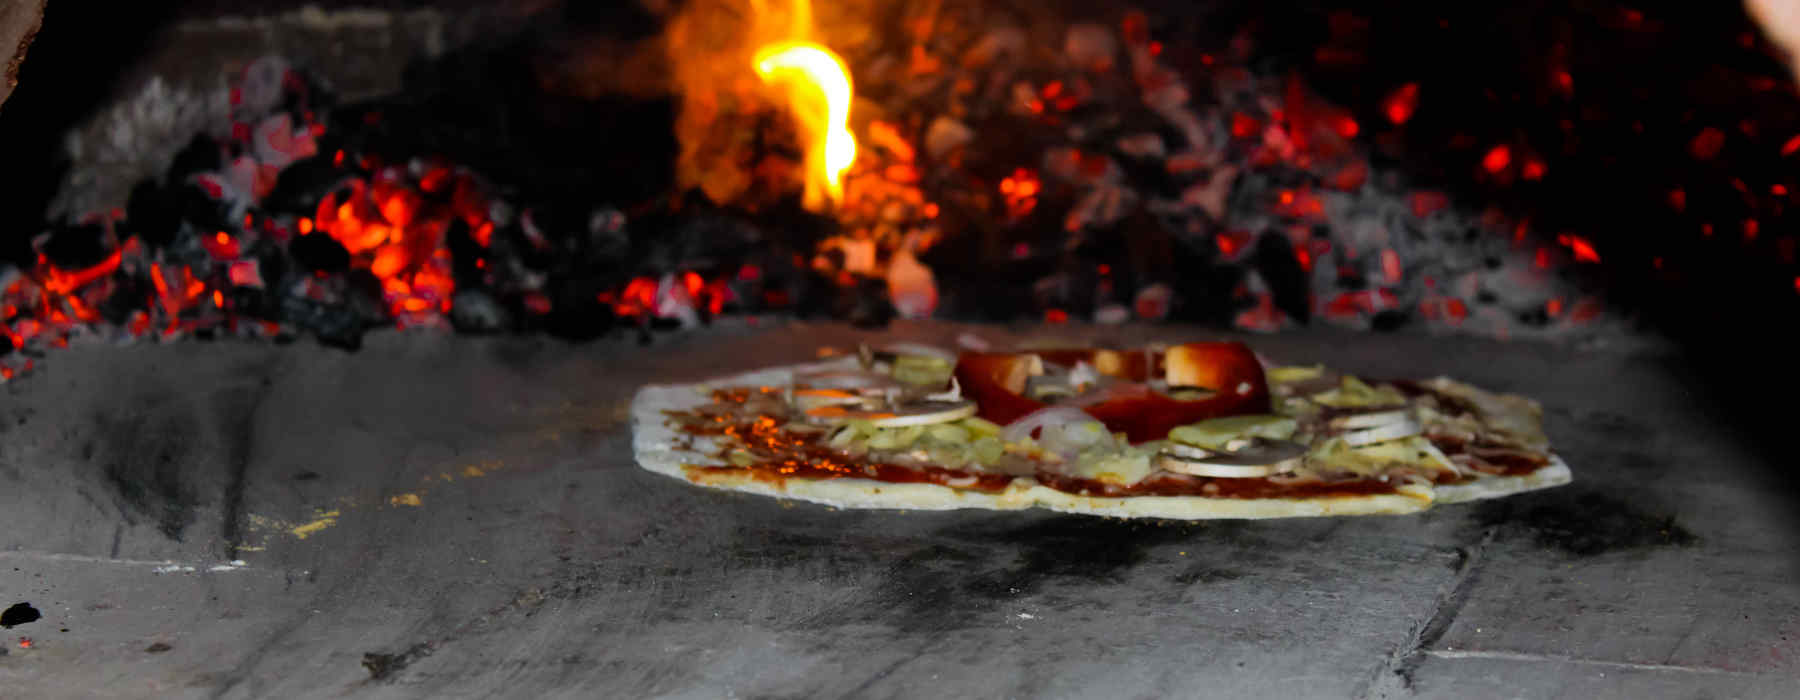 recette pizza vegan legume ete